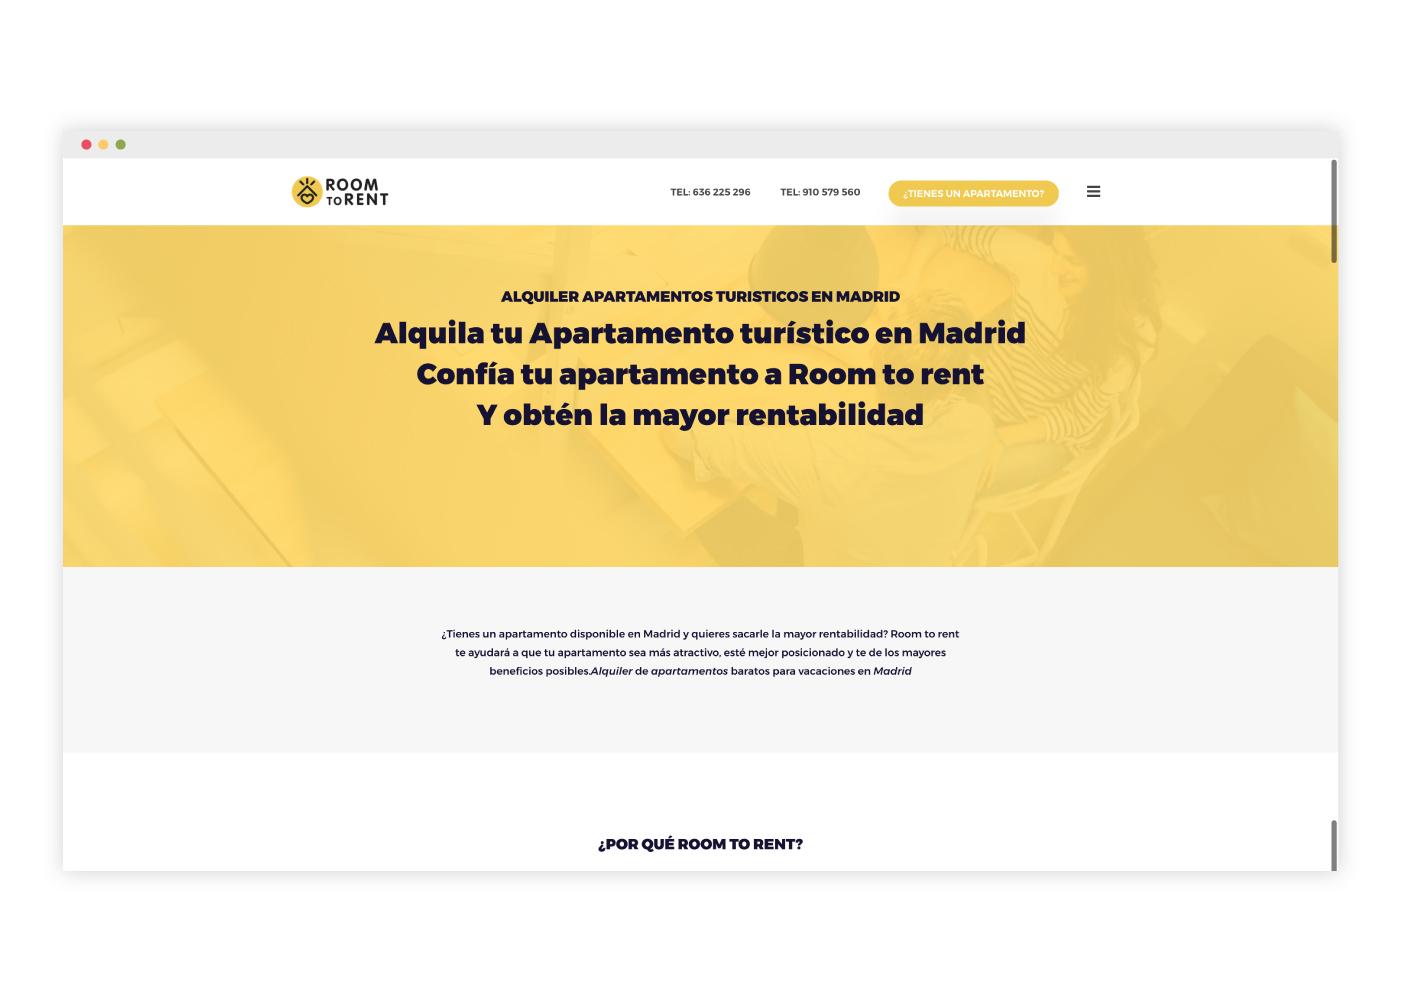 diseno-web-programacion-gestion-apartamentos-turisticos-madrid